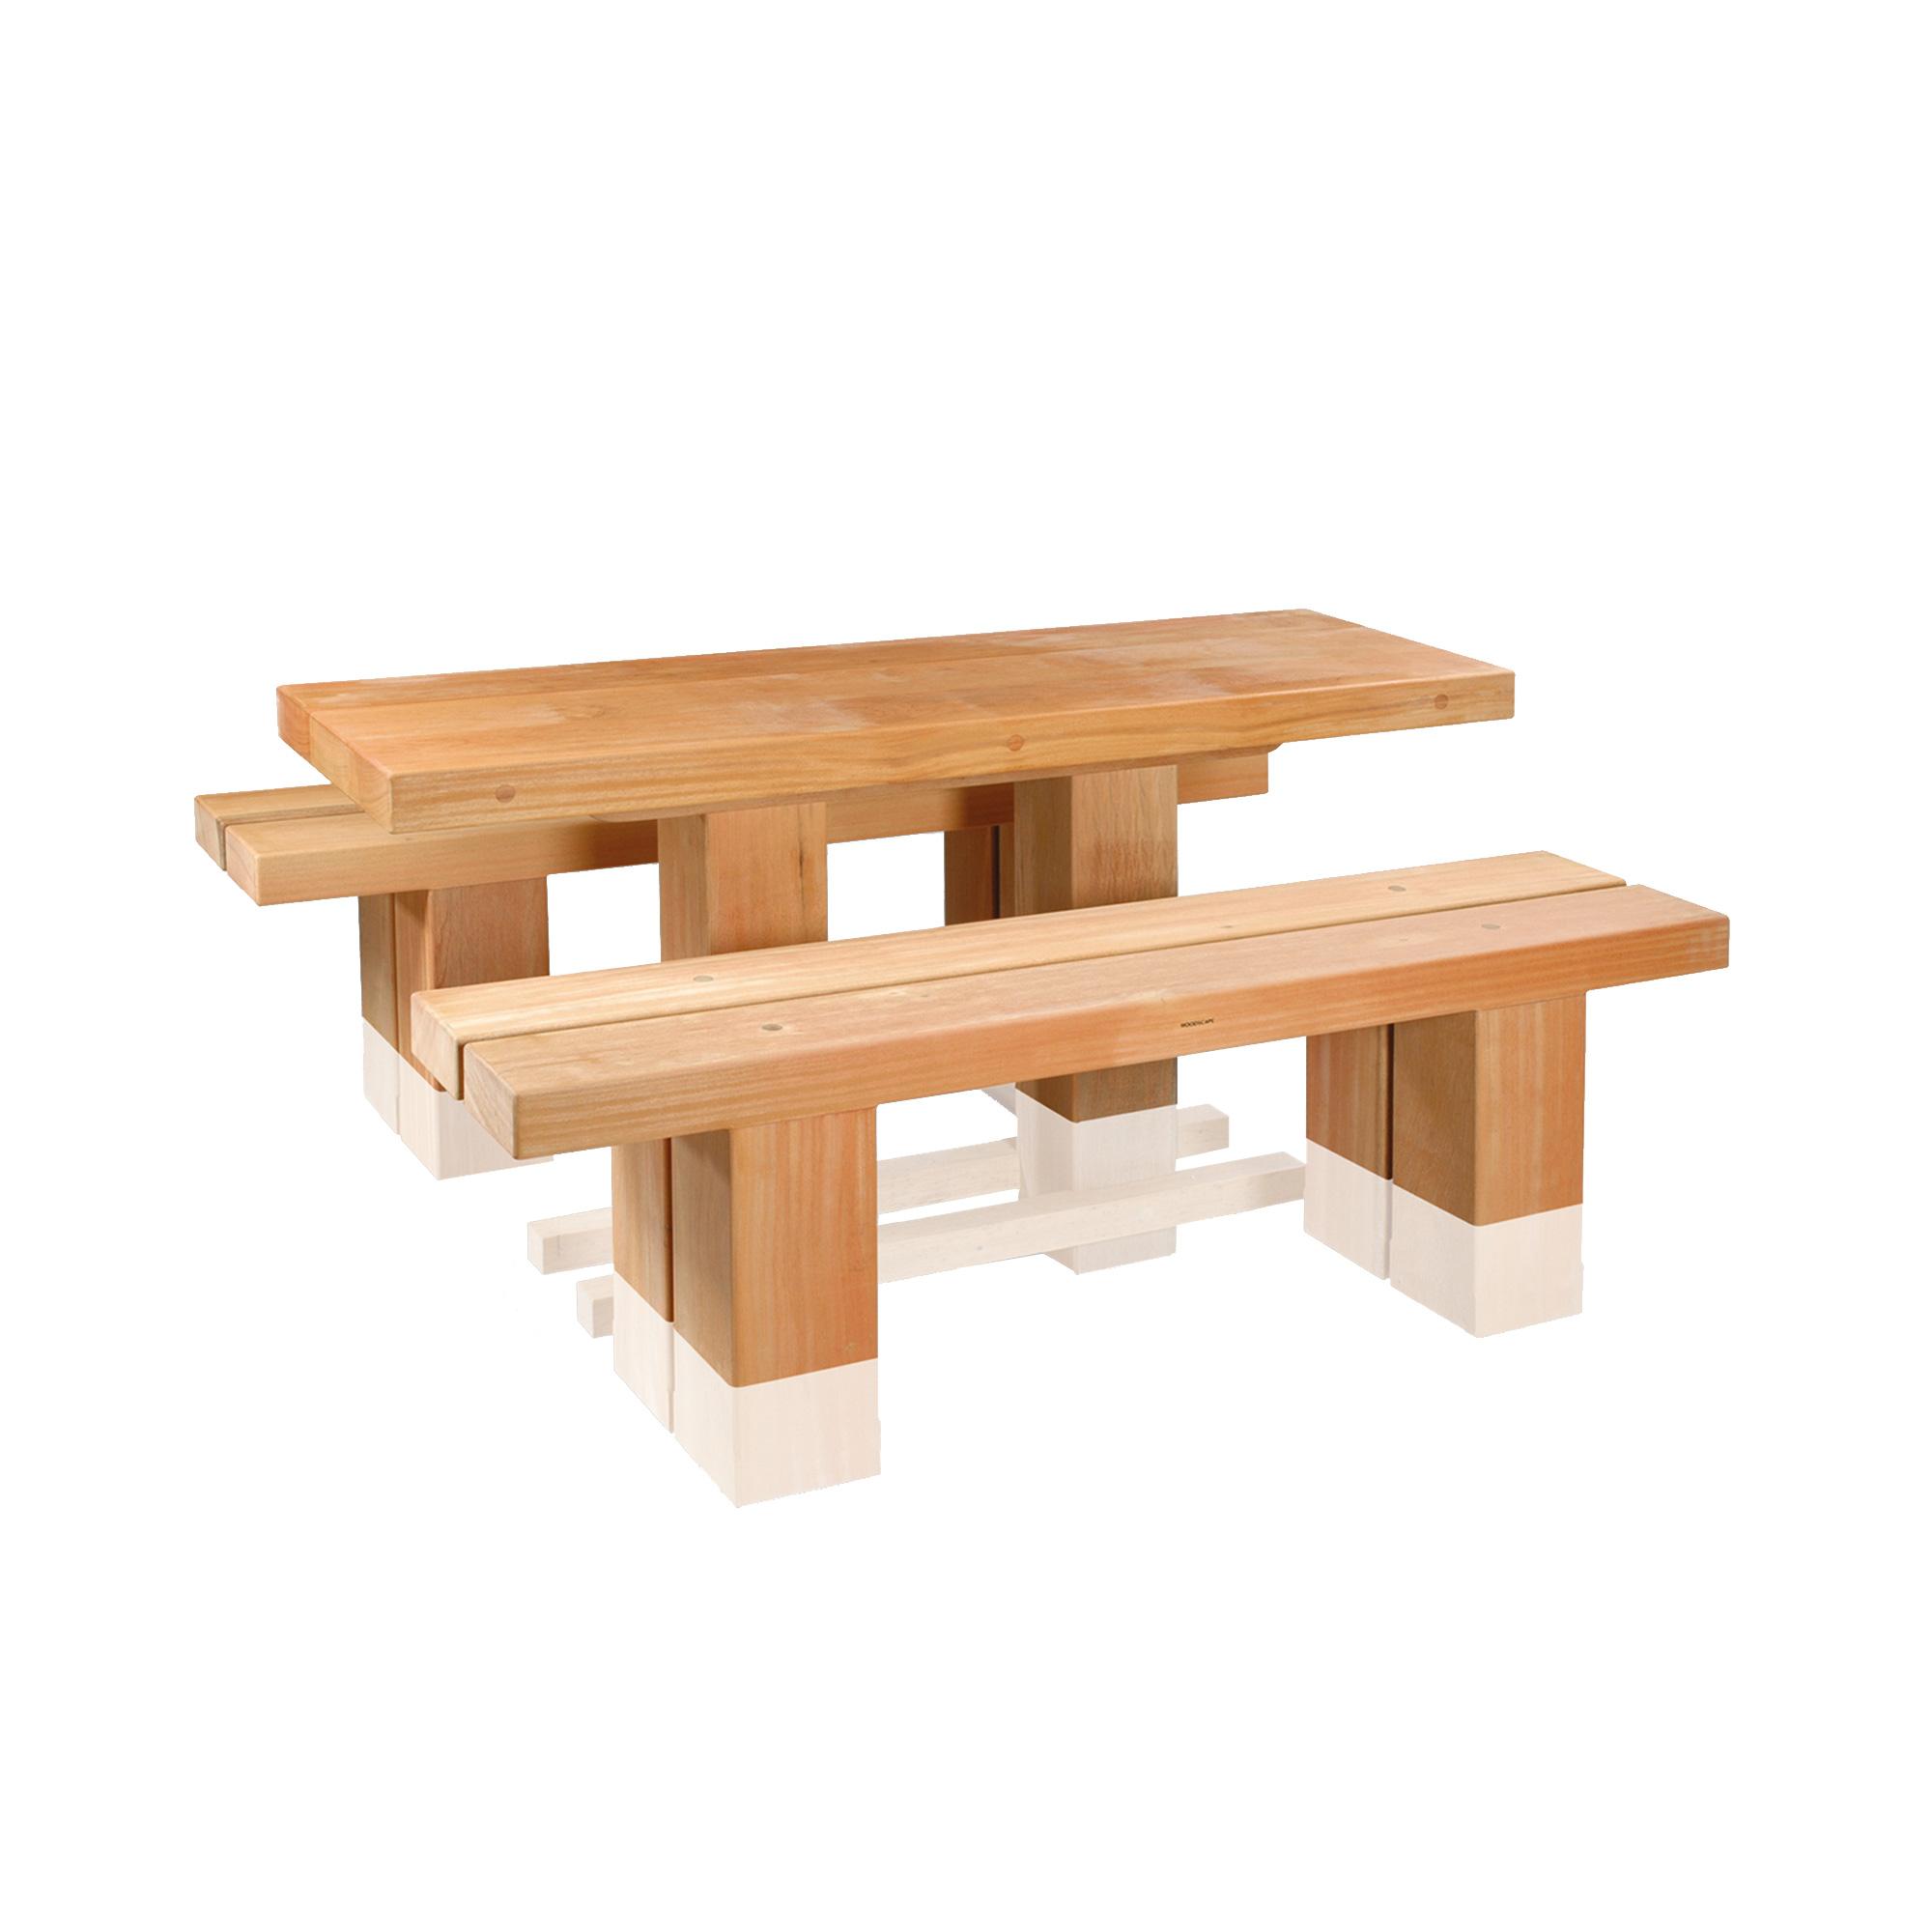 Standard picnic set woodscape home woodscape street furniture picnic sets standard picnic set watchthetrailerfo